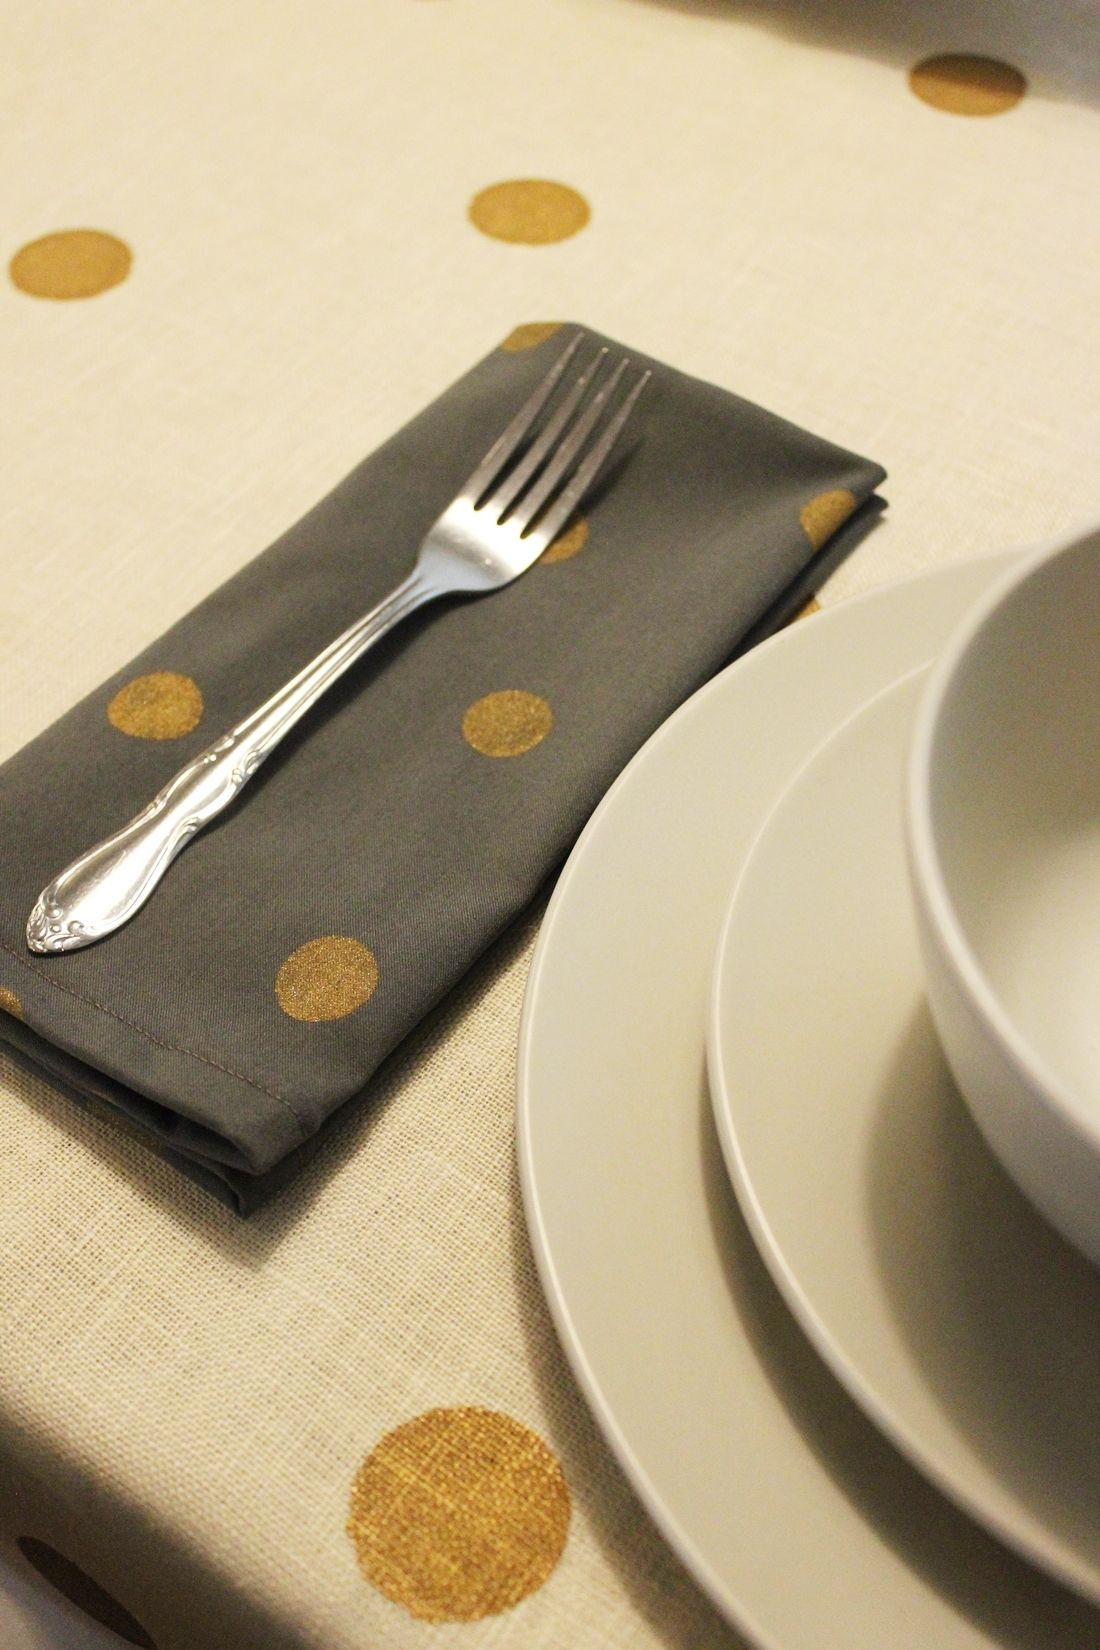 DIY Polka Dot Napkins and an Easy Way to Fold Them